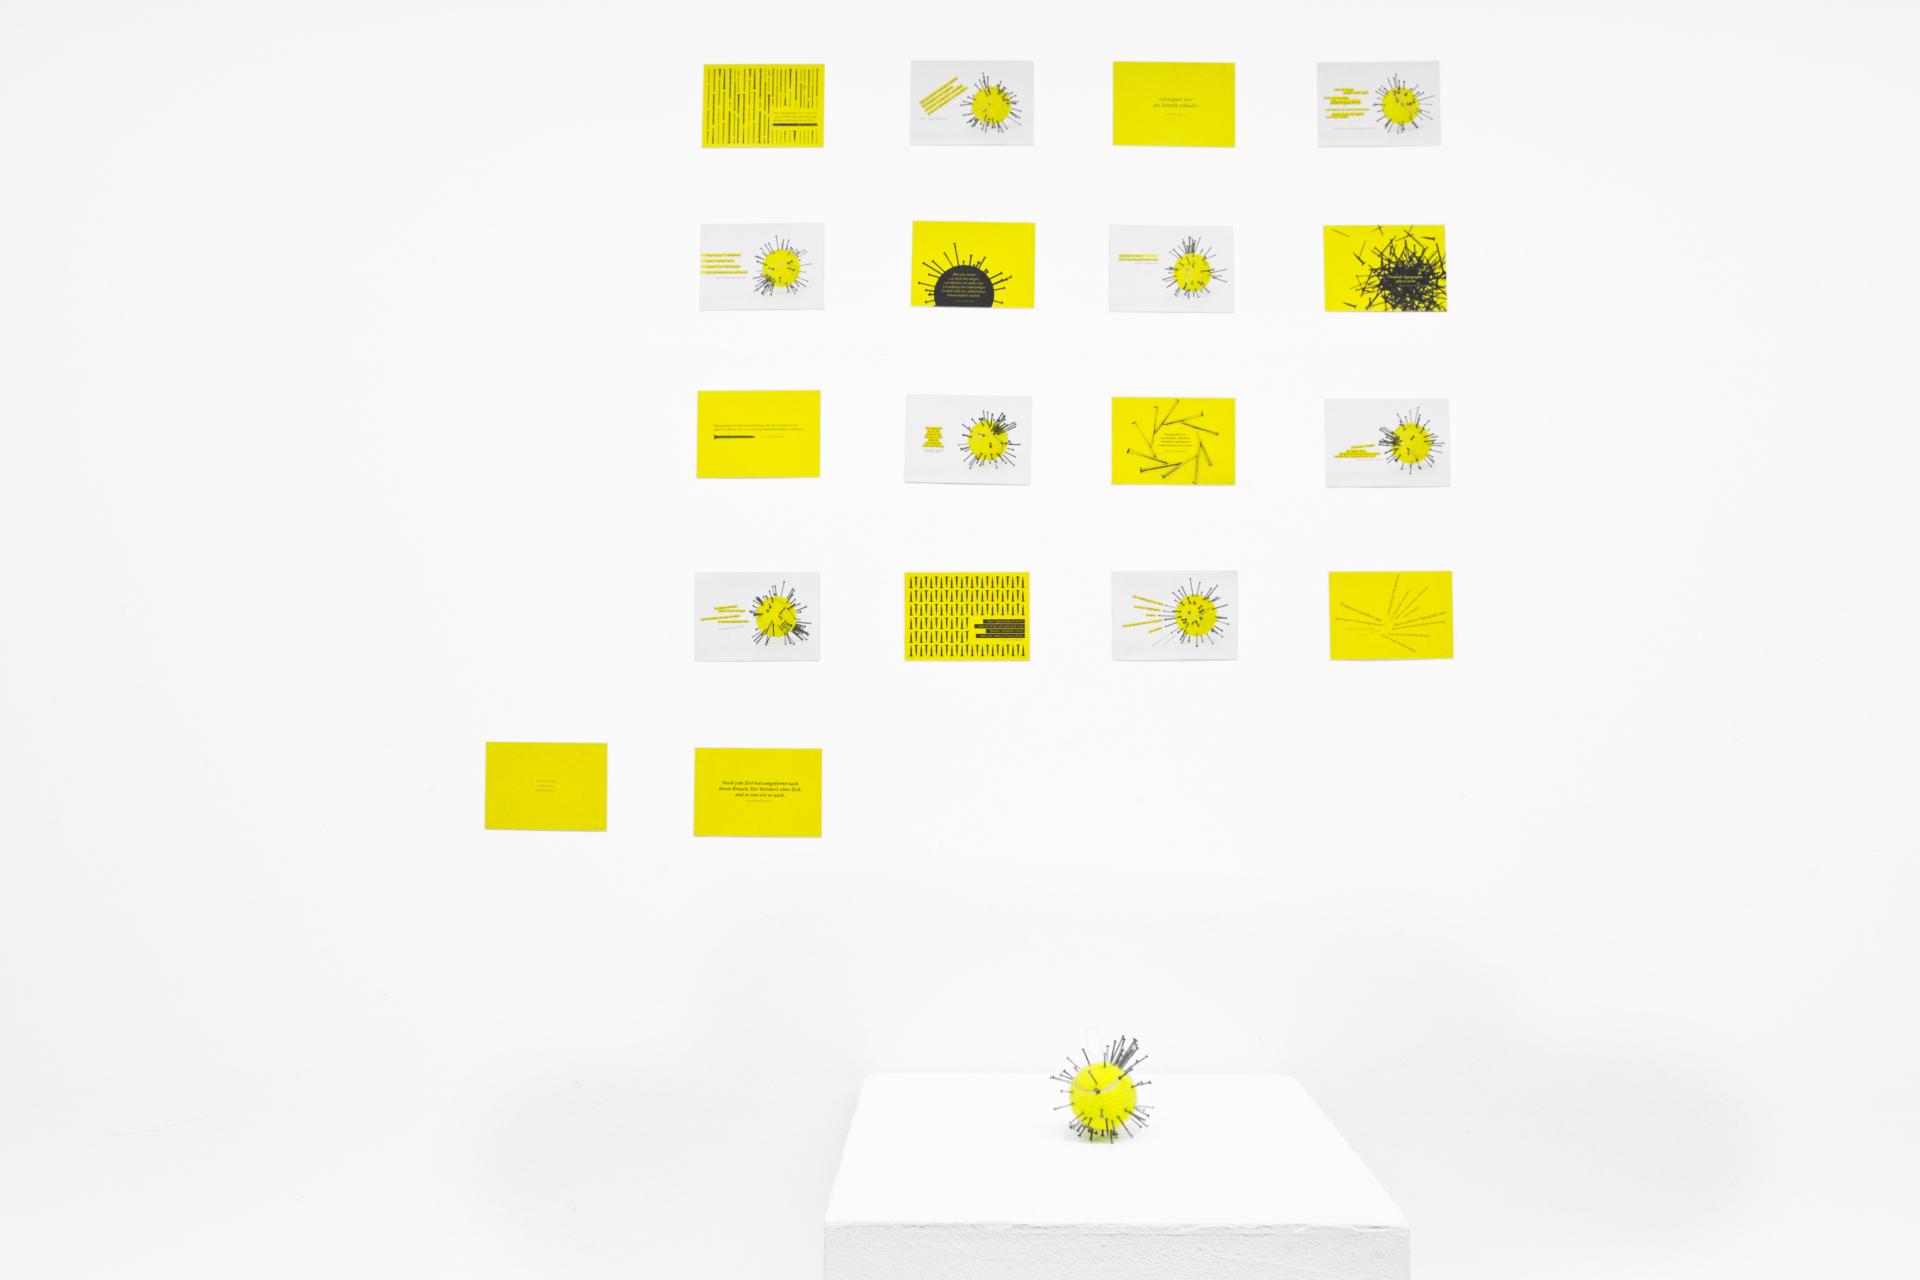 meandsarah – Grafikdesign 3D-Schriftssystem